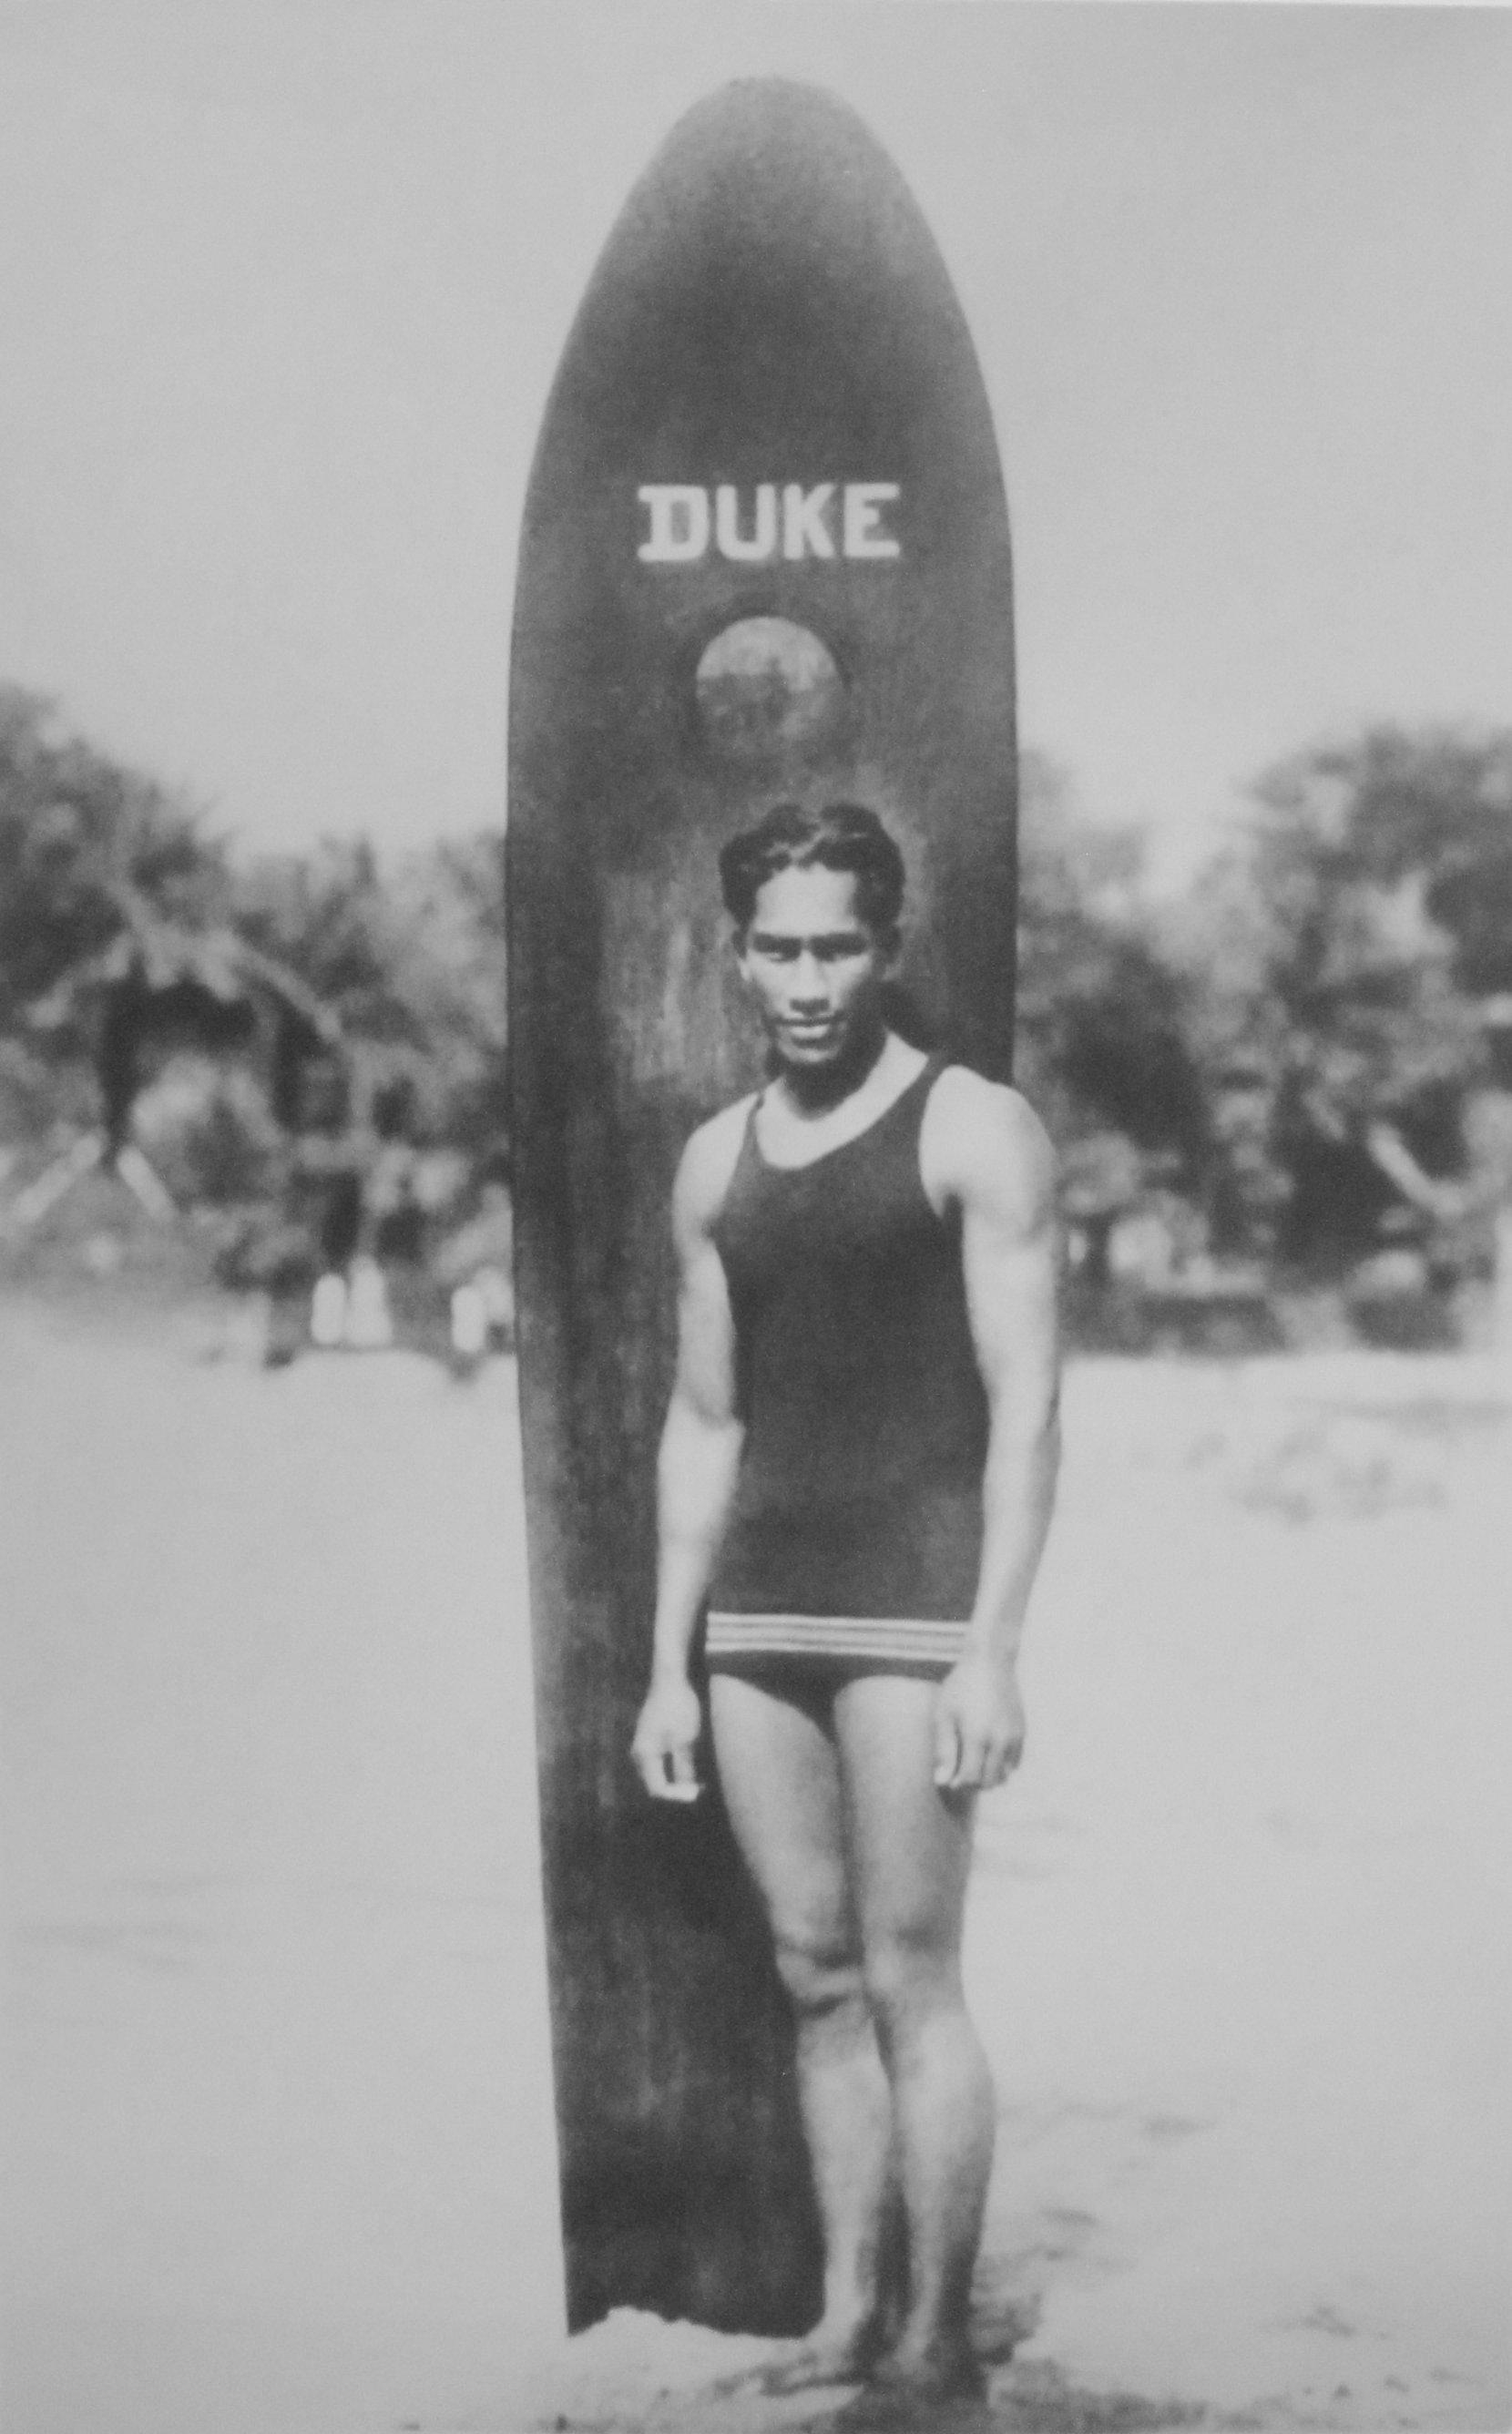 Duke Kahanamoku with his Surfboard